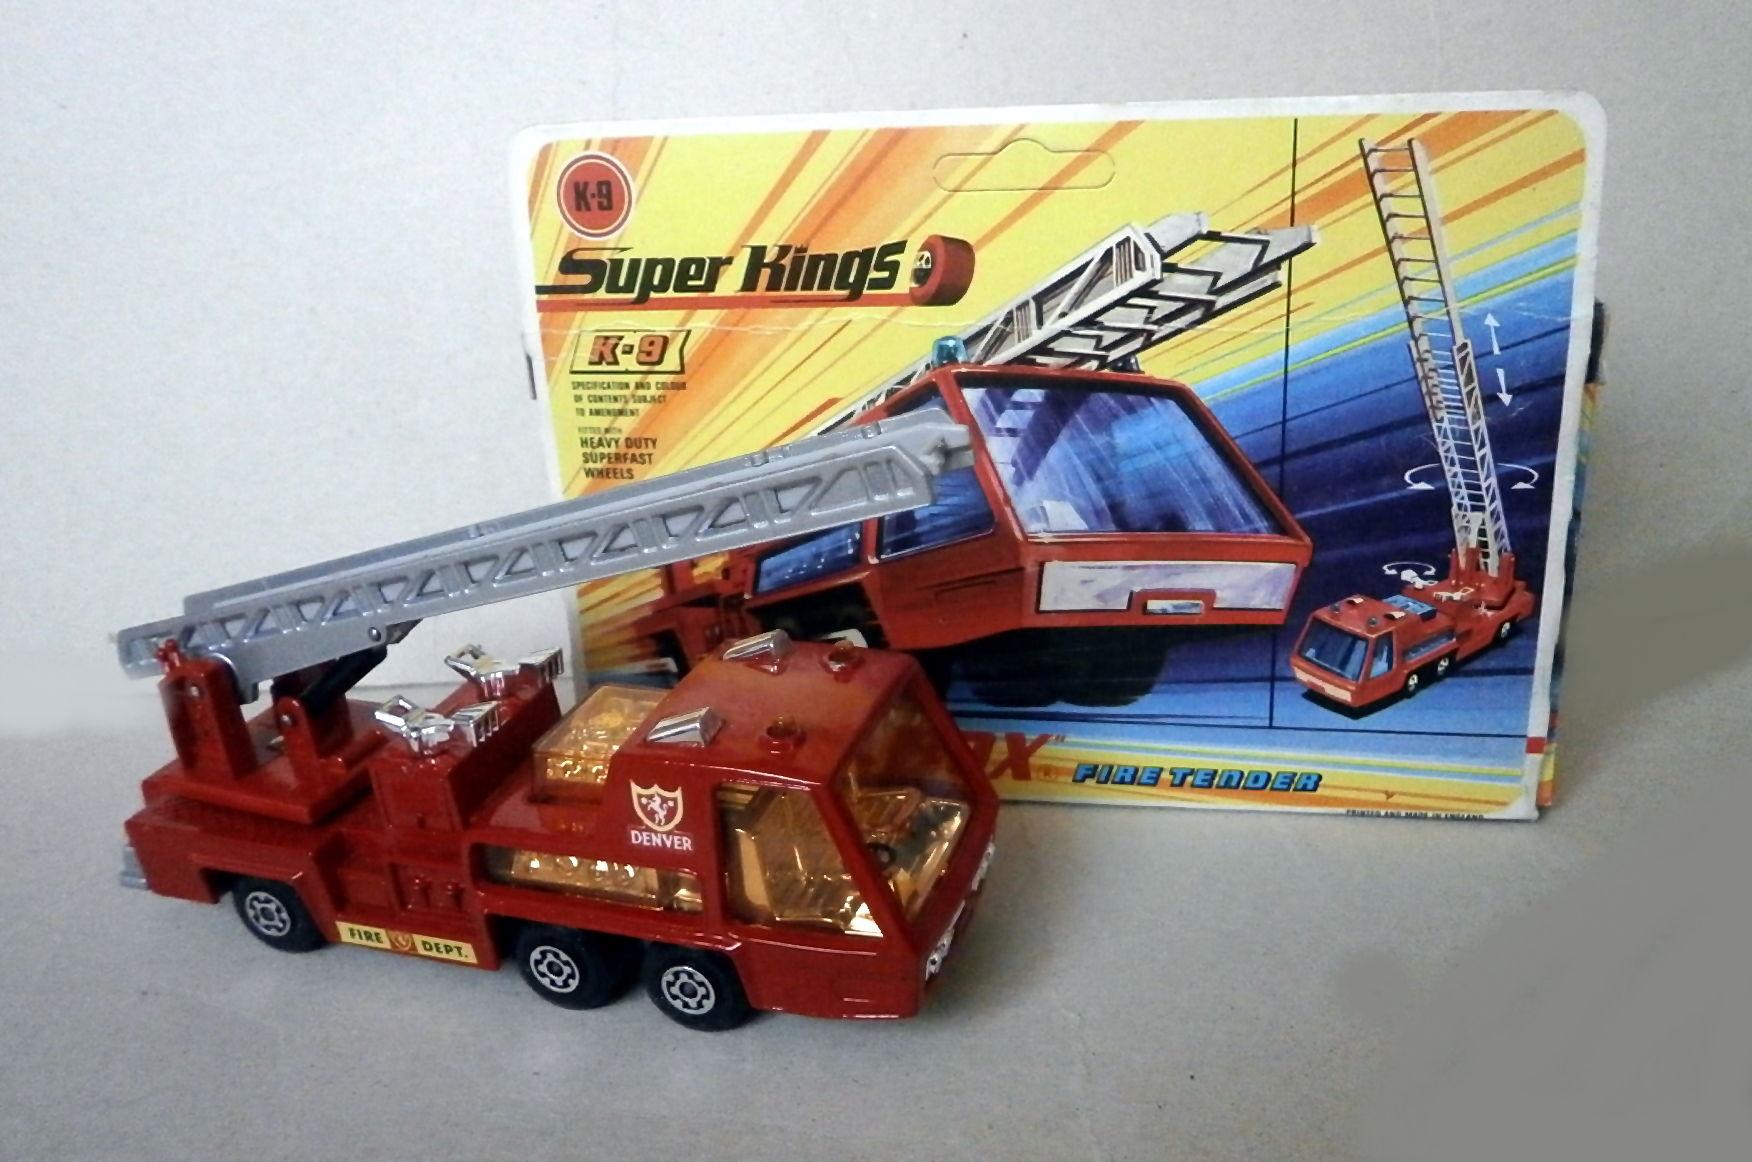 Fire Tender (K-9)